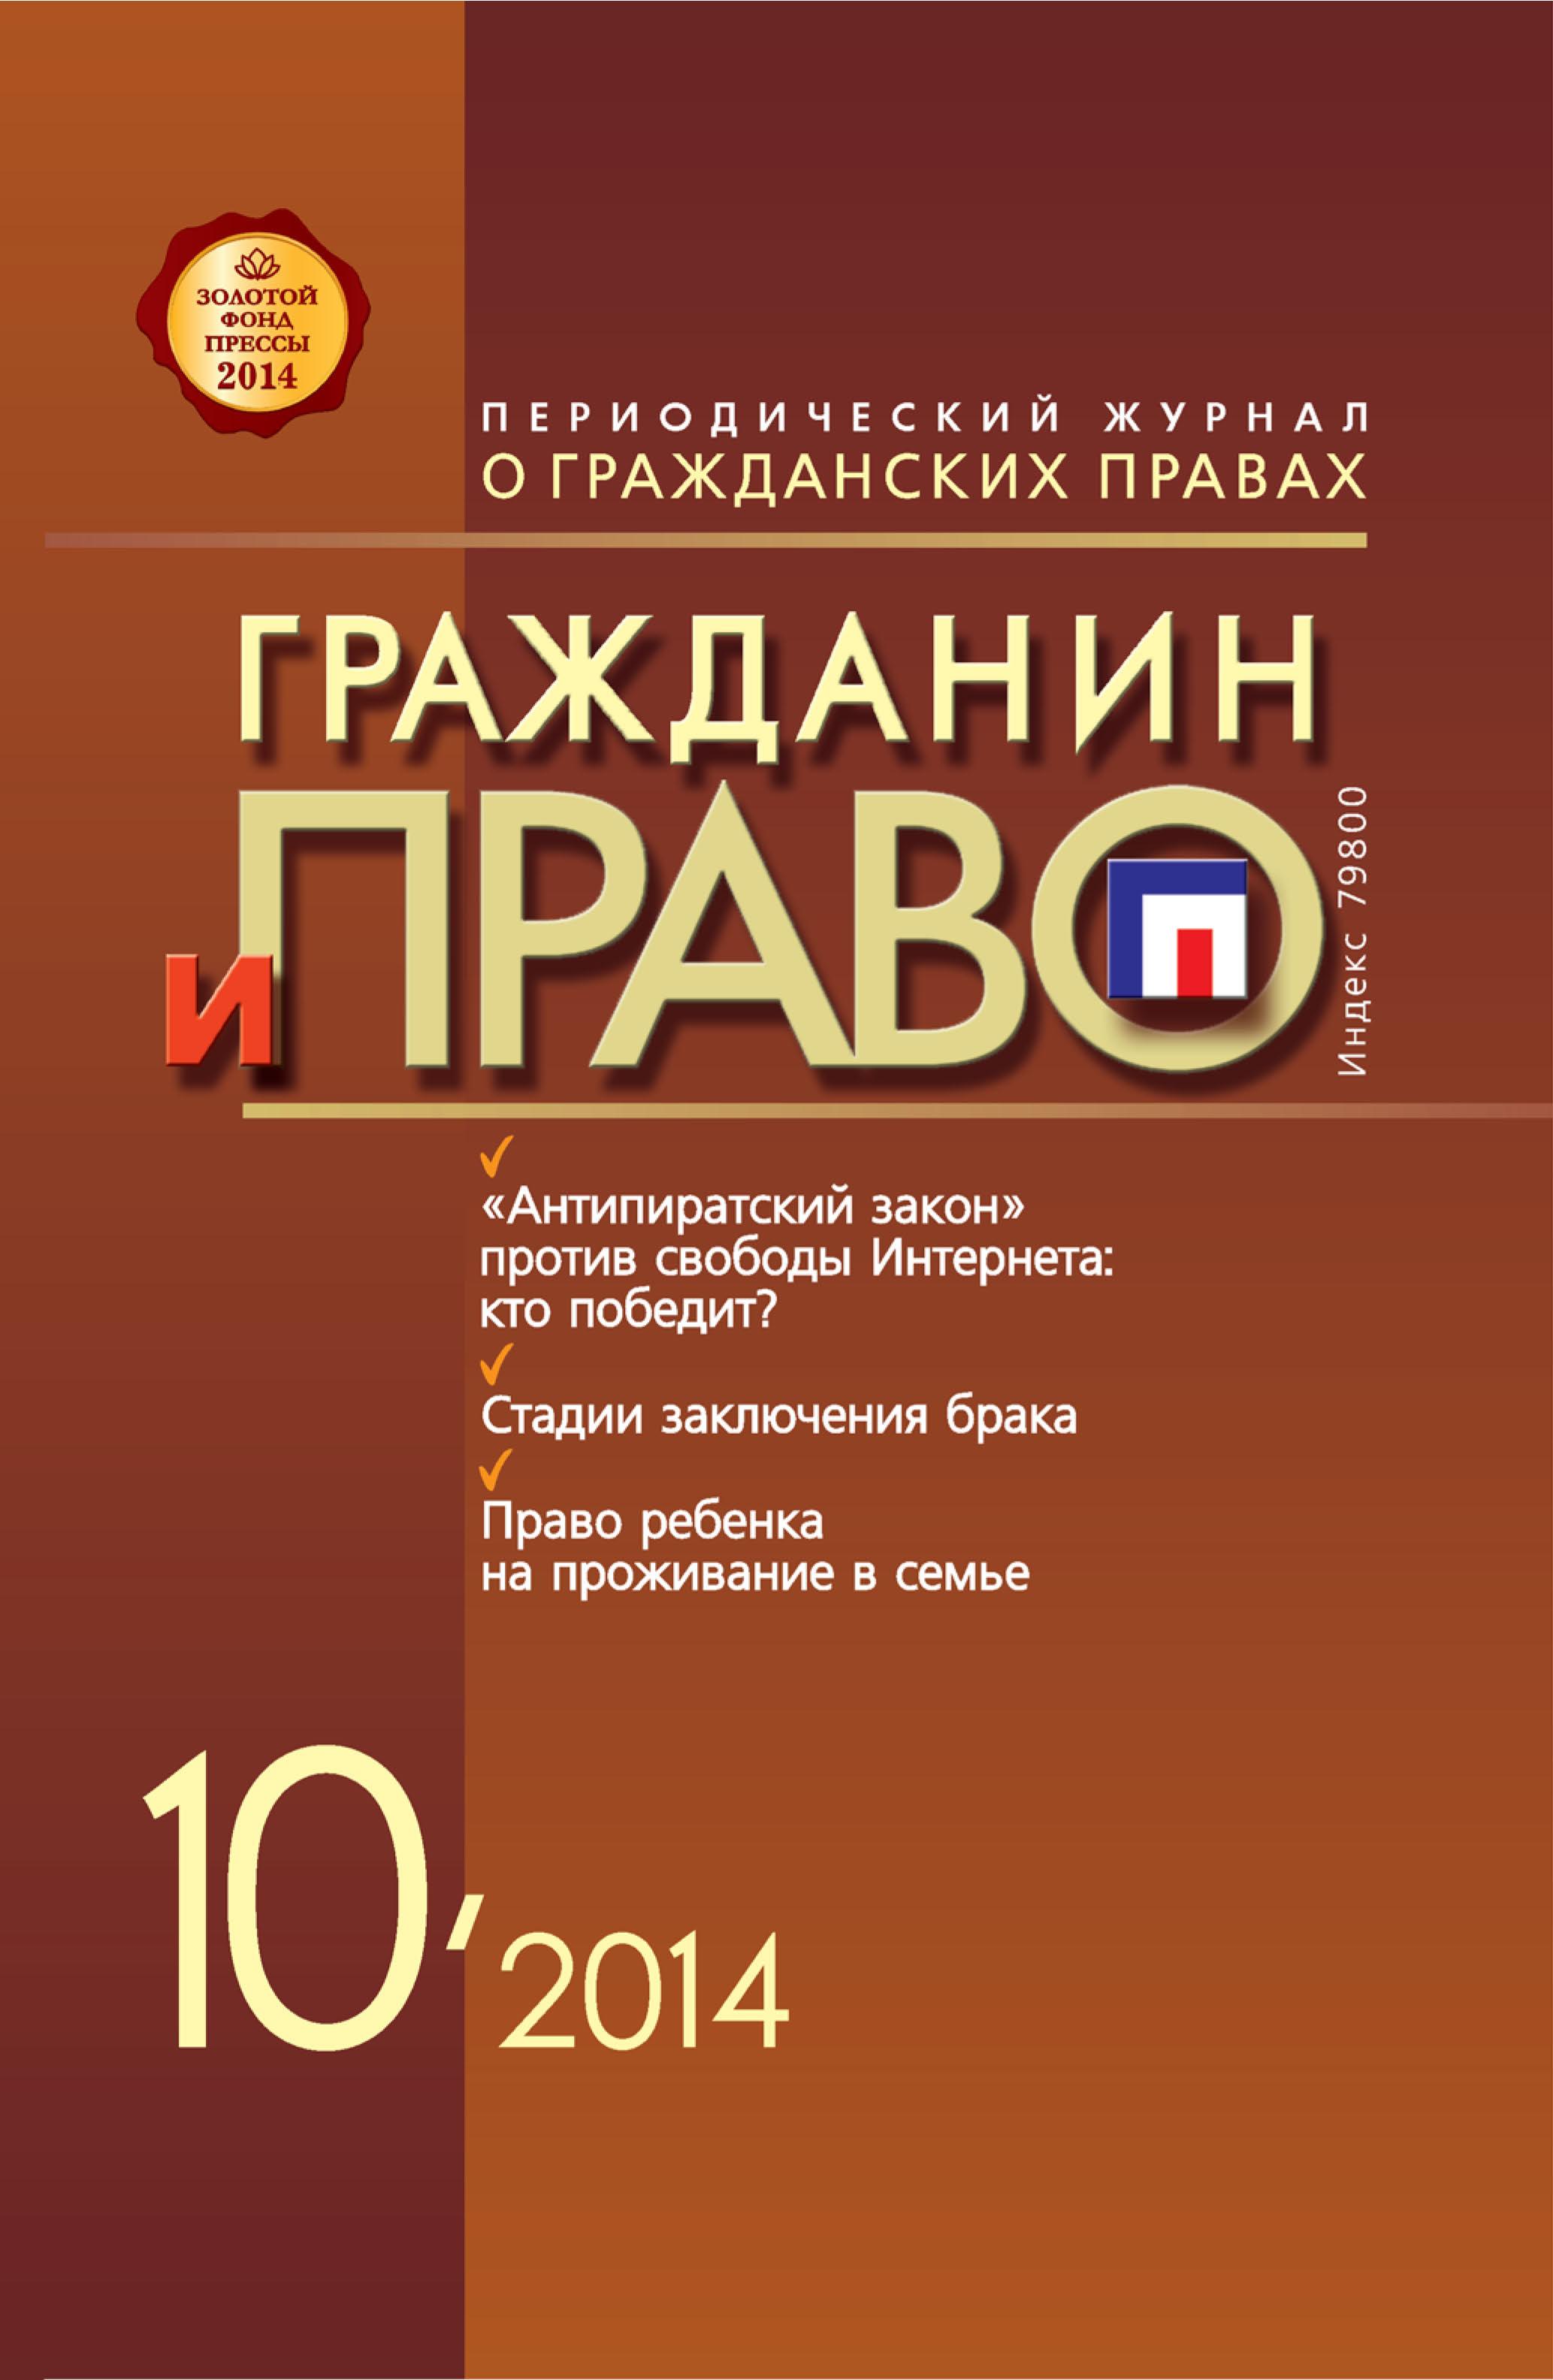 Гражданин и право №10/2014